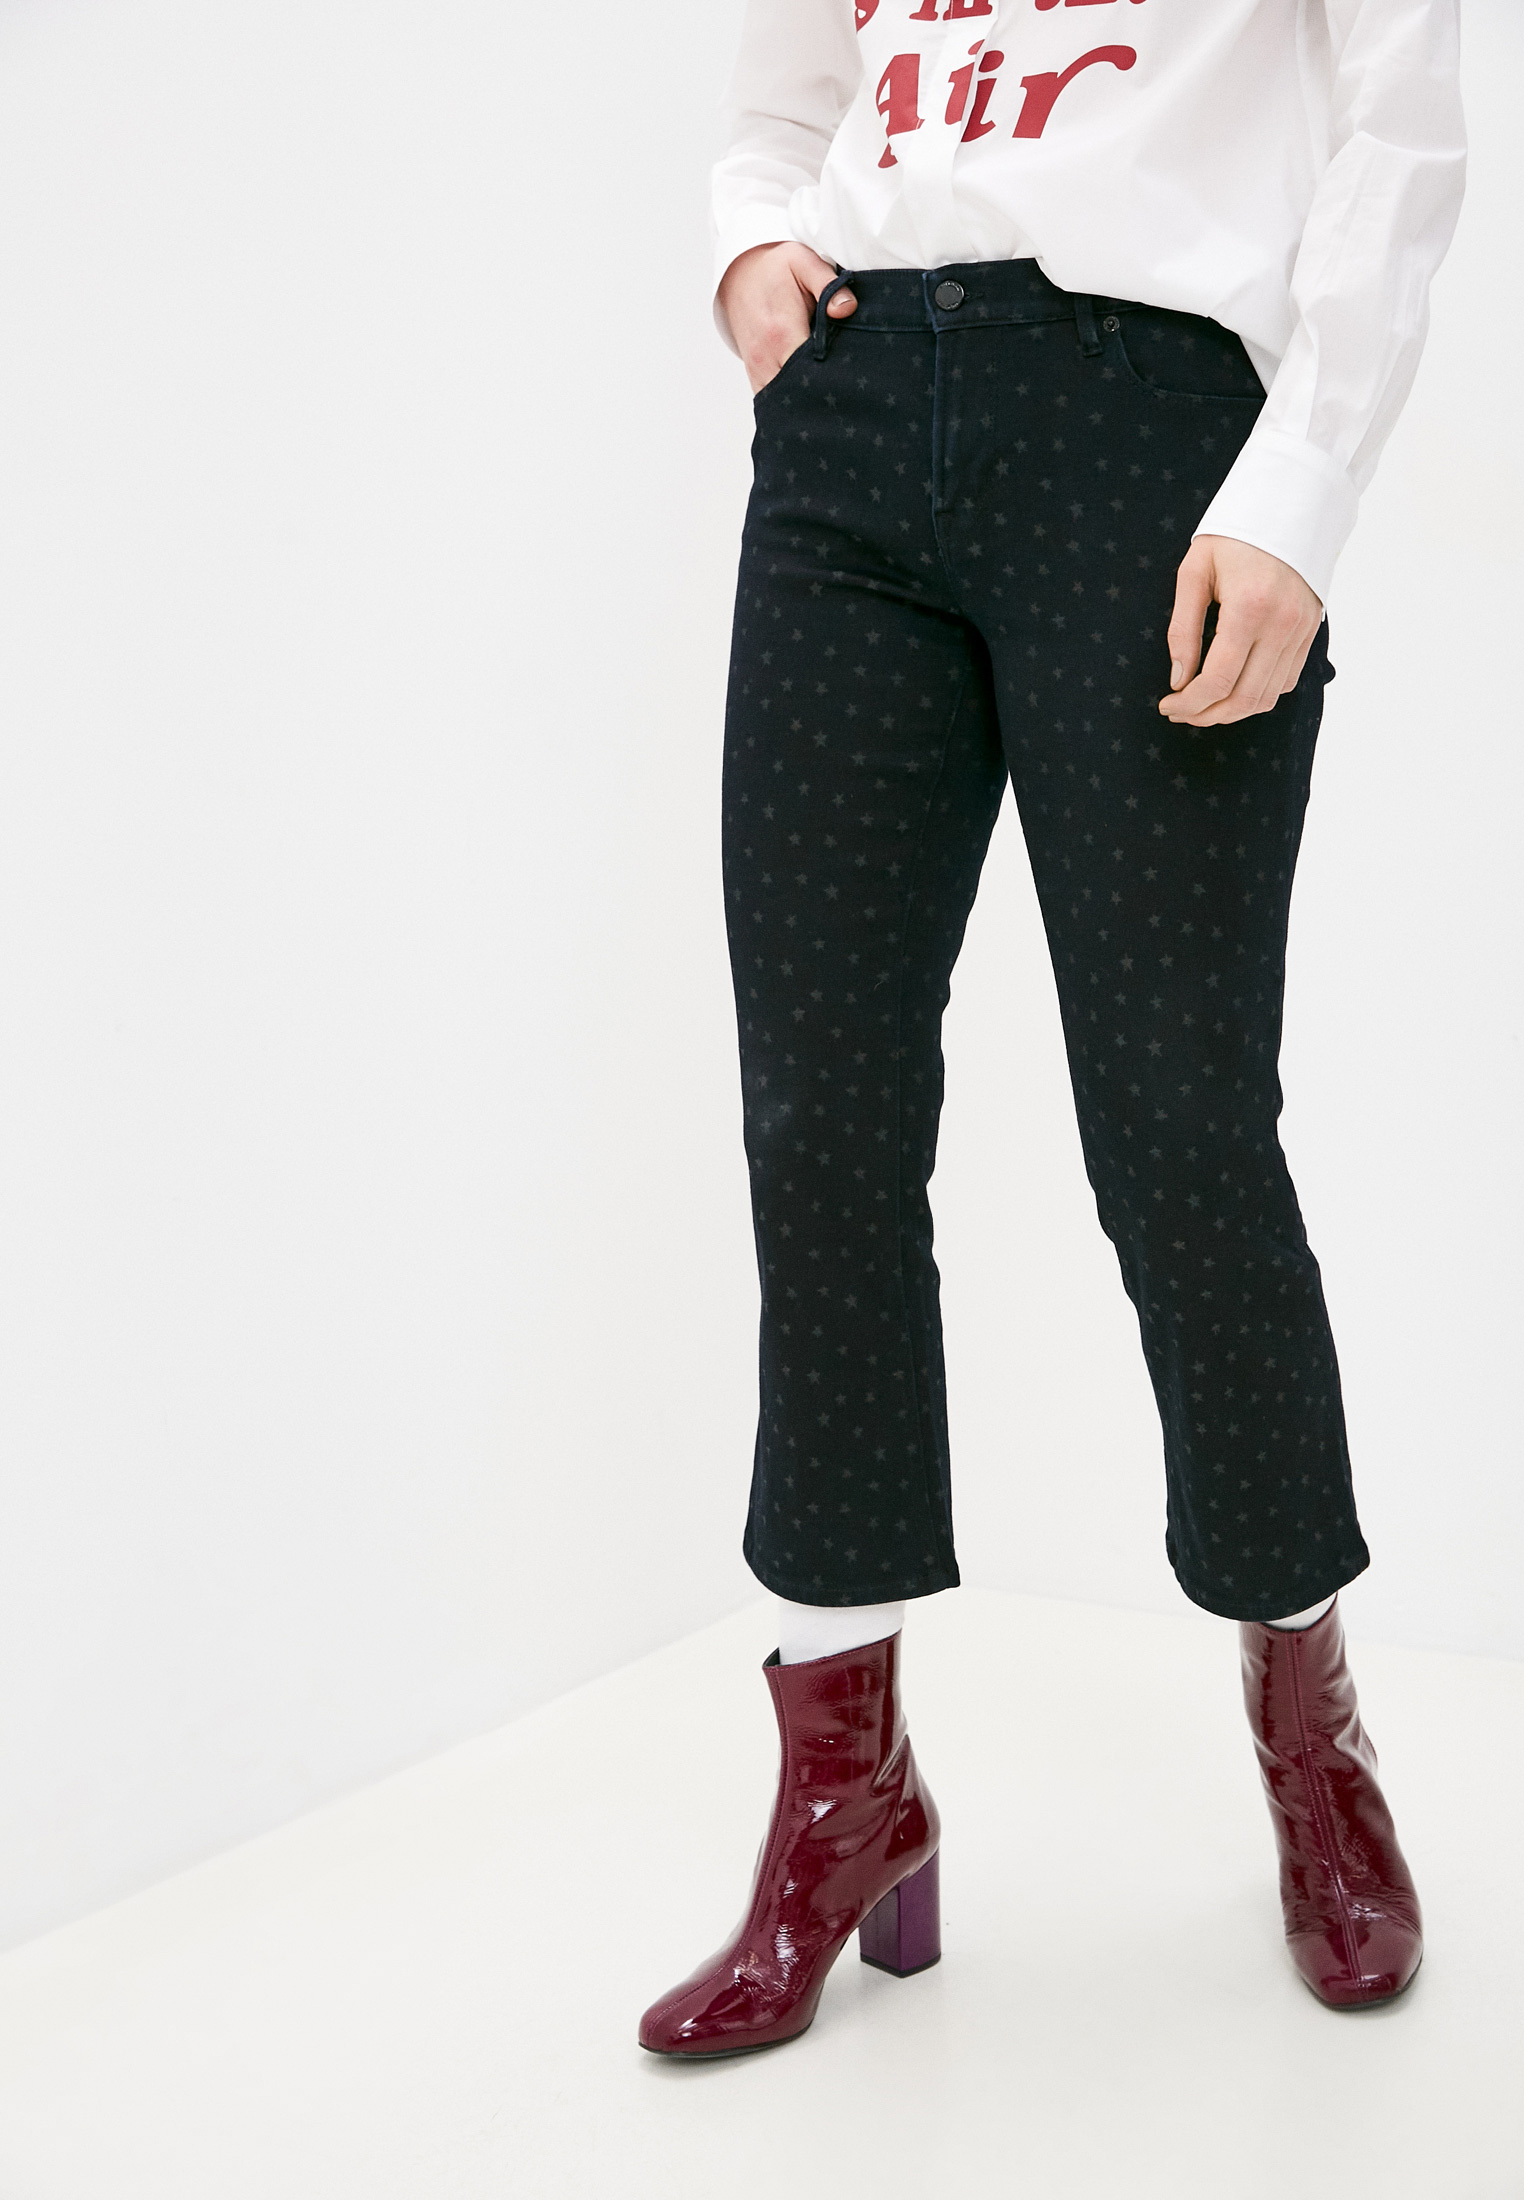 Зауженные джинсы Love Moschino W Q 423 00 S 3113